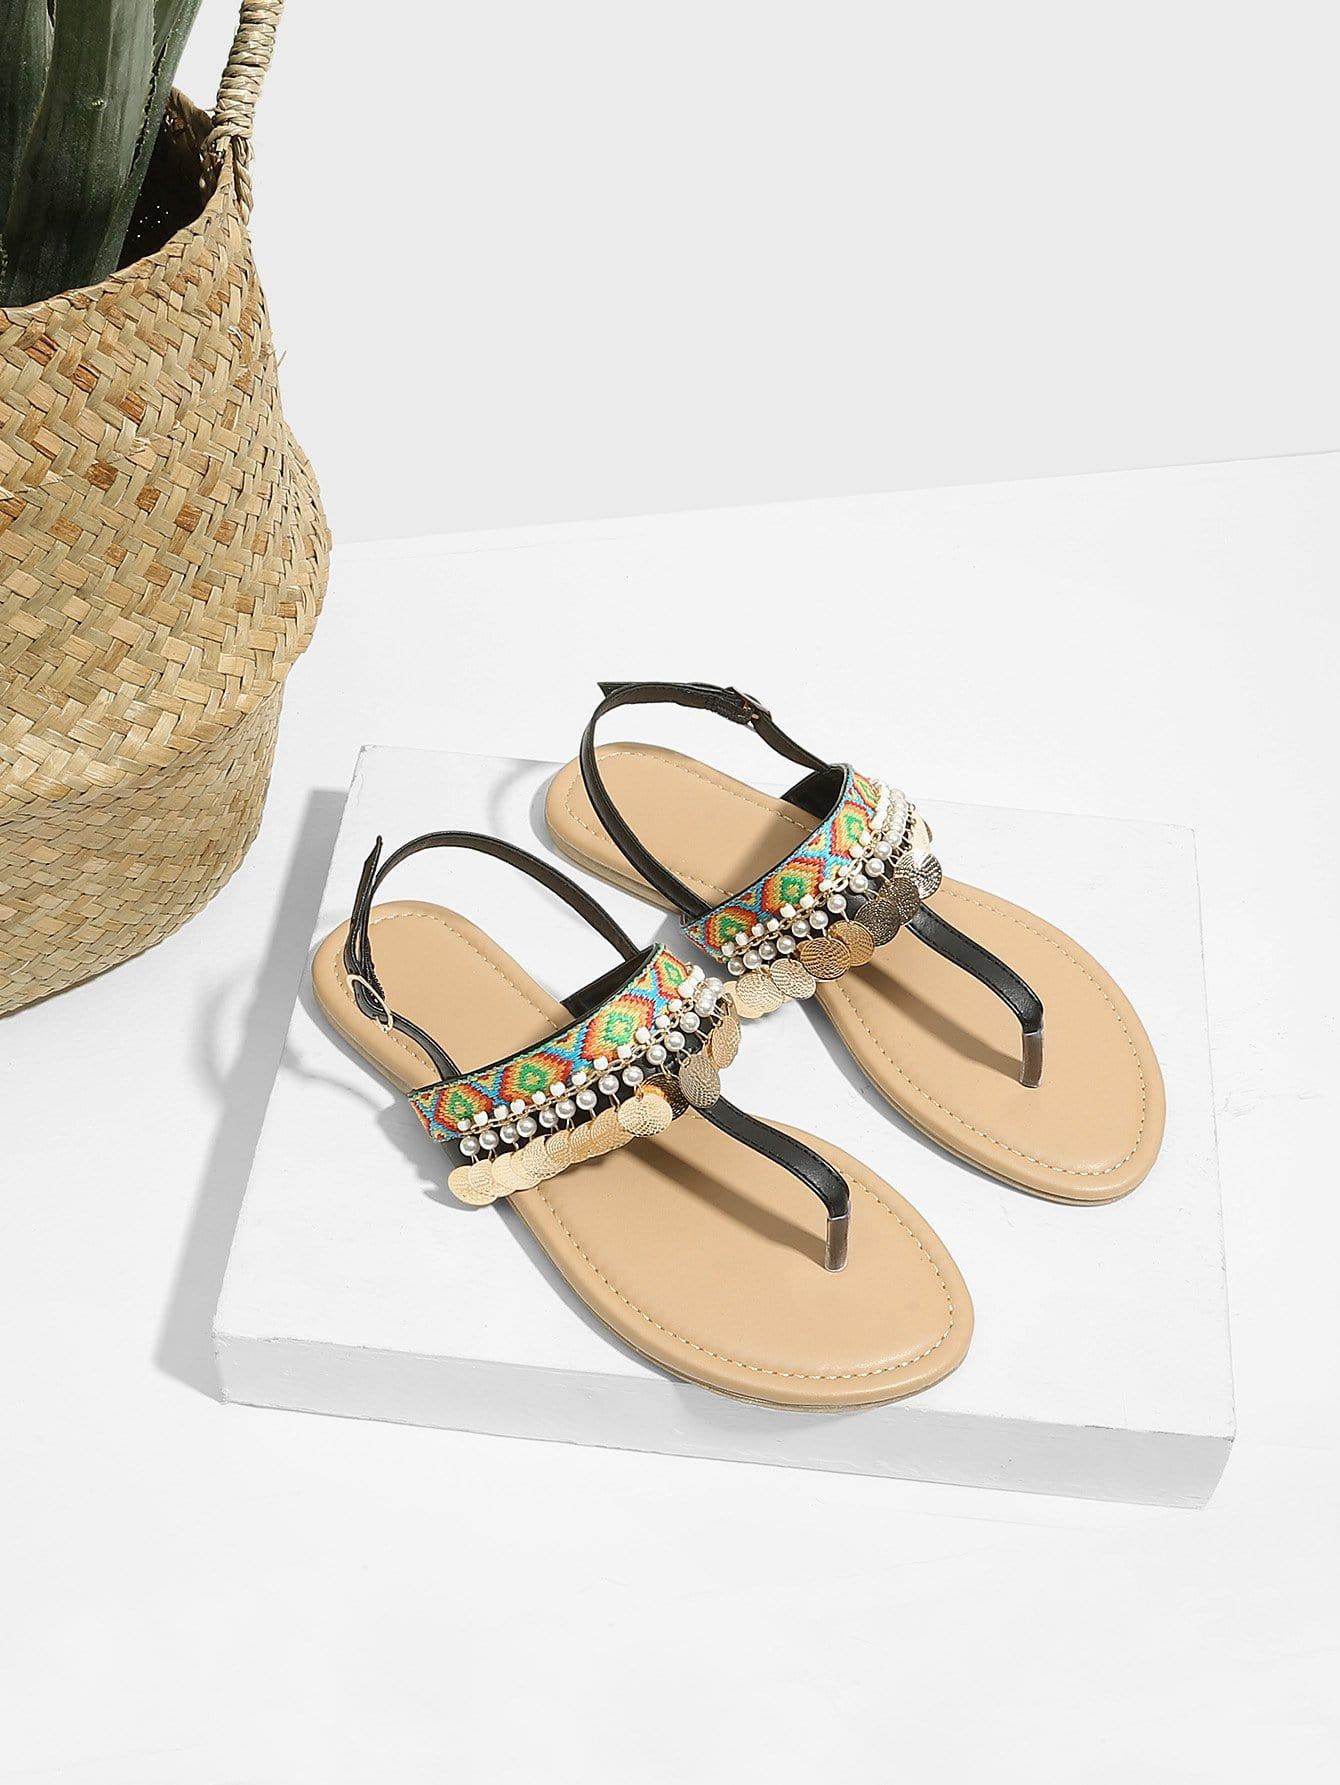 Flat Disc Toe Post Sandals rose decorated toe post flat sandals